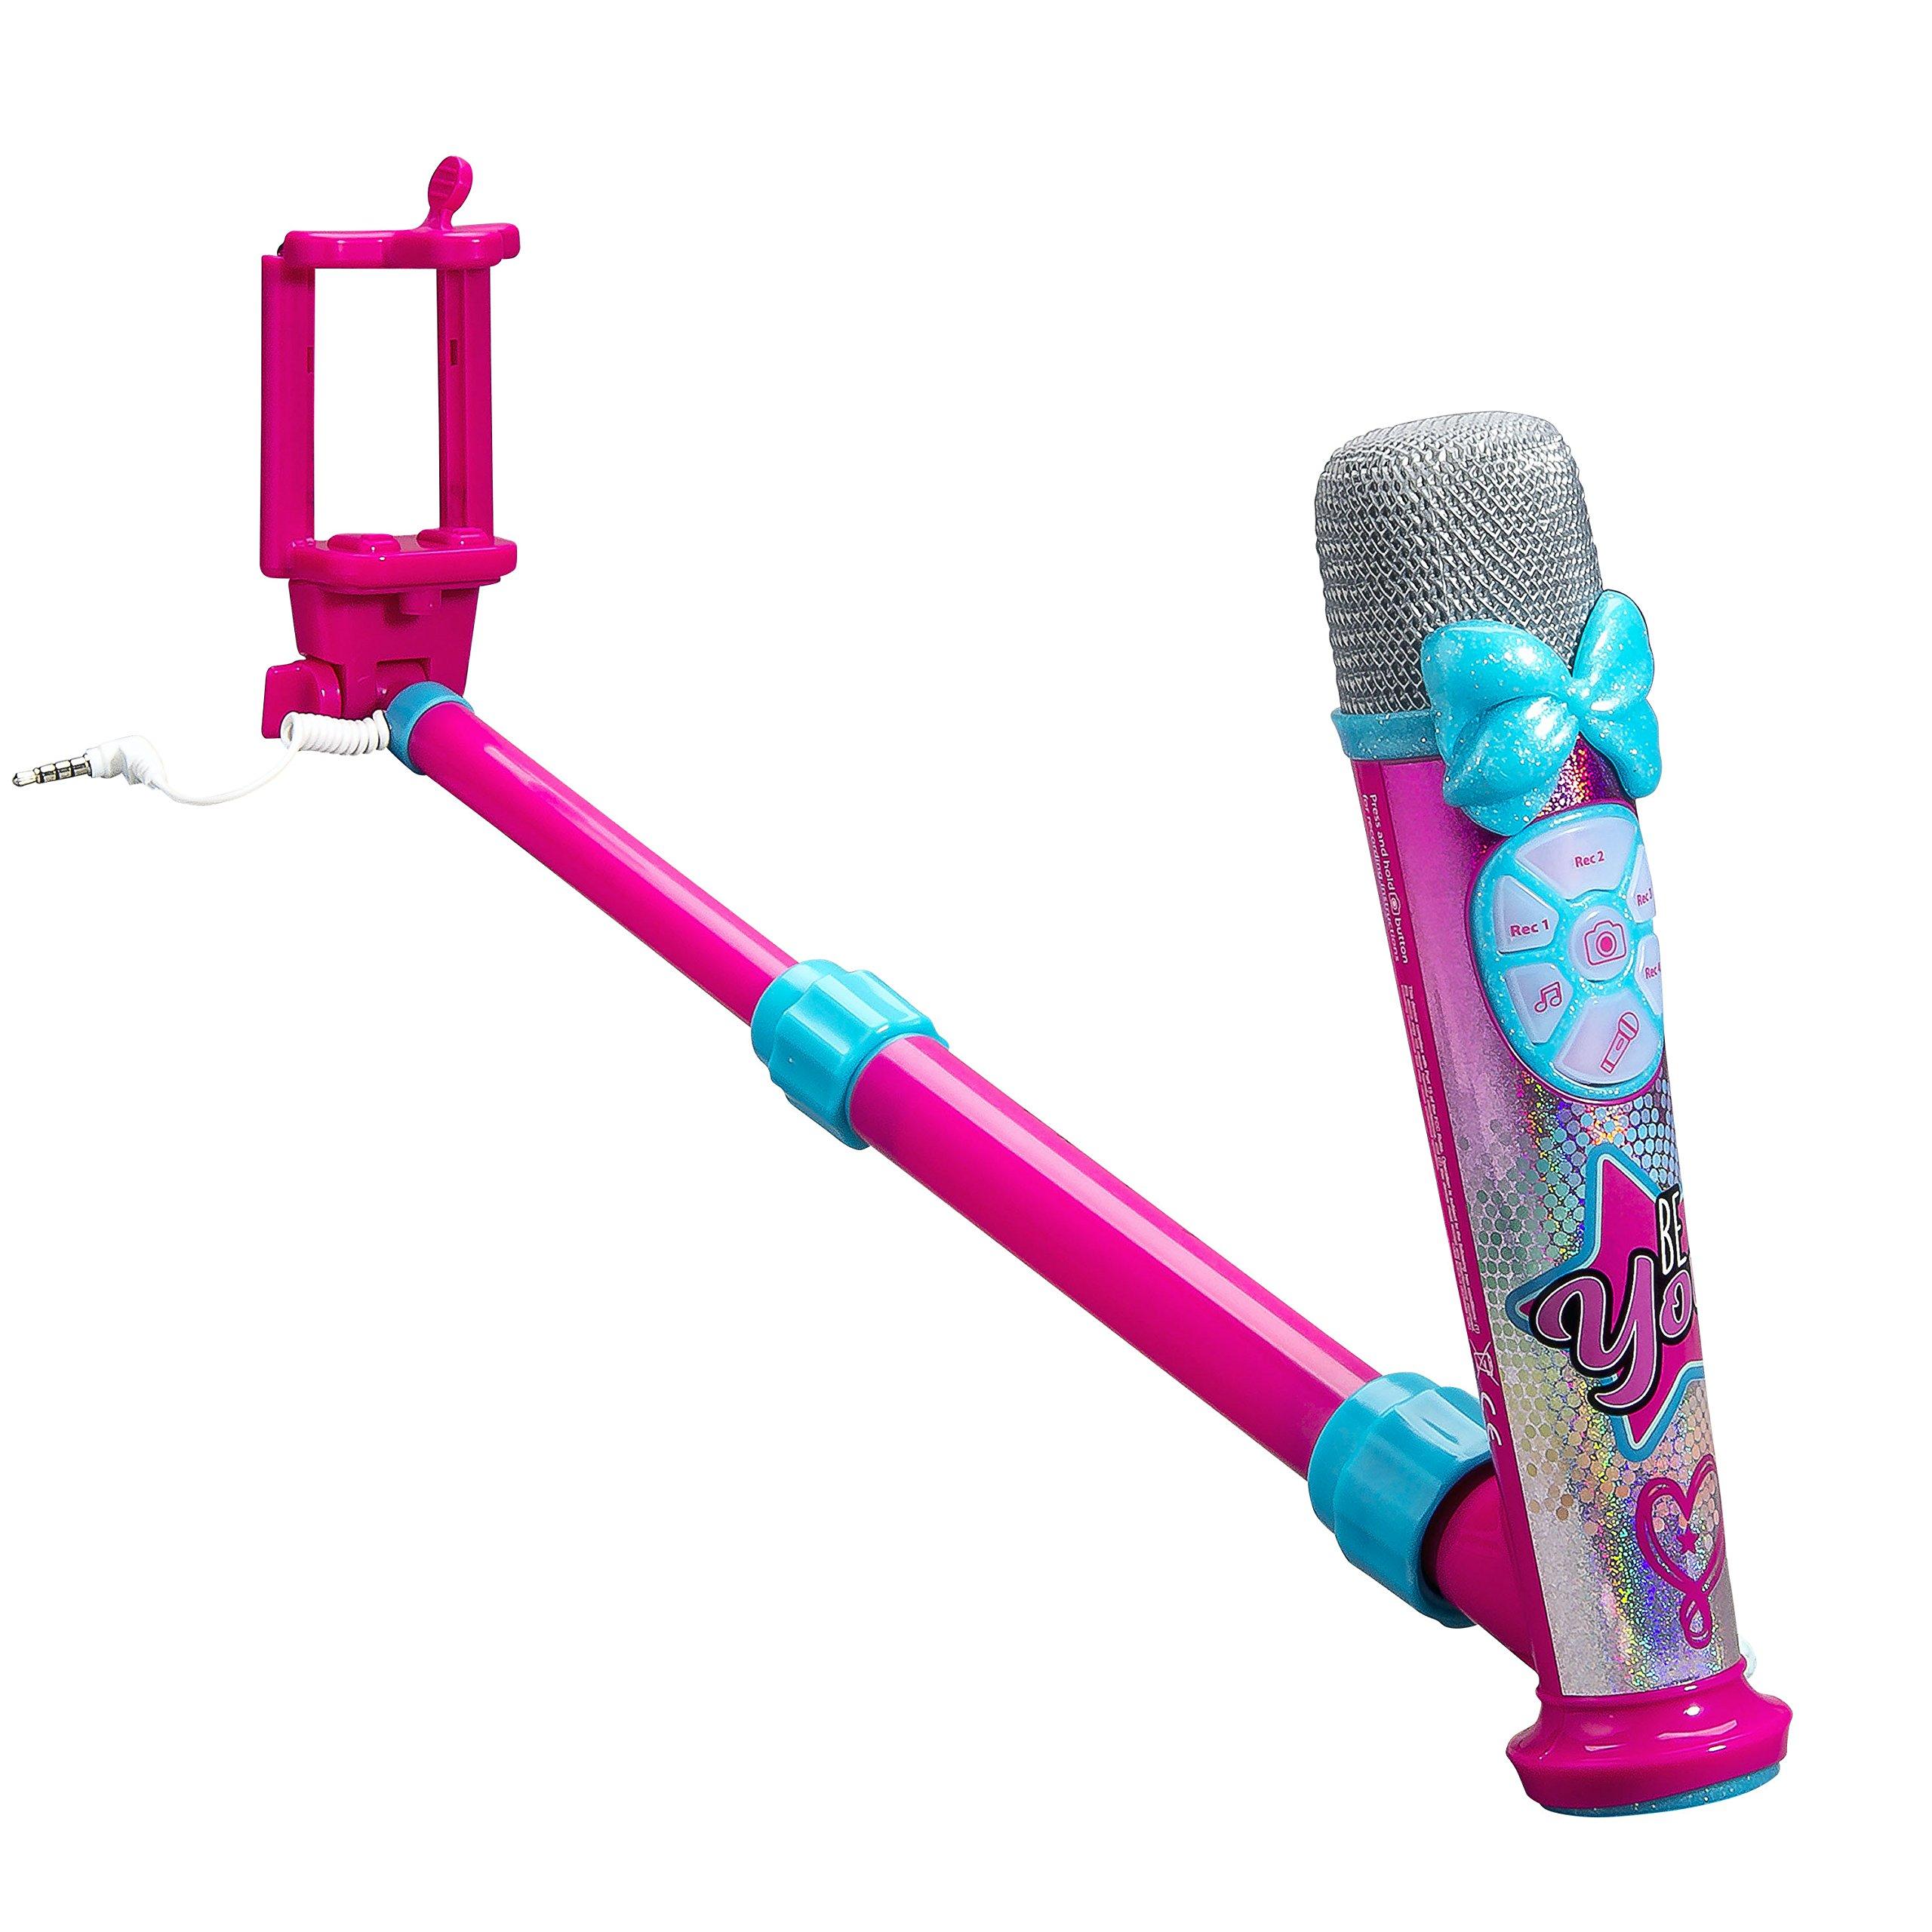 eKids JoJo Siwa Selfie Star Studio - App Enhanced Selfie Stick - Video Recording Microphone by eKids (Image #2)